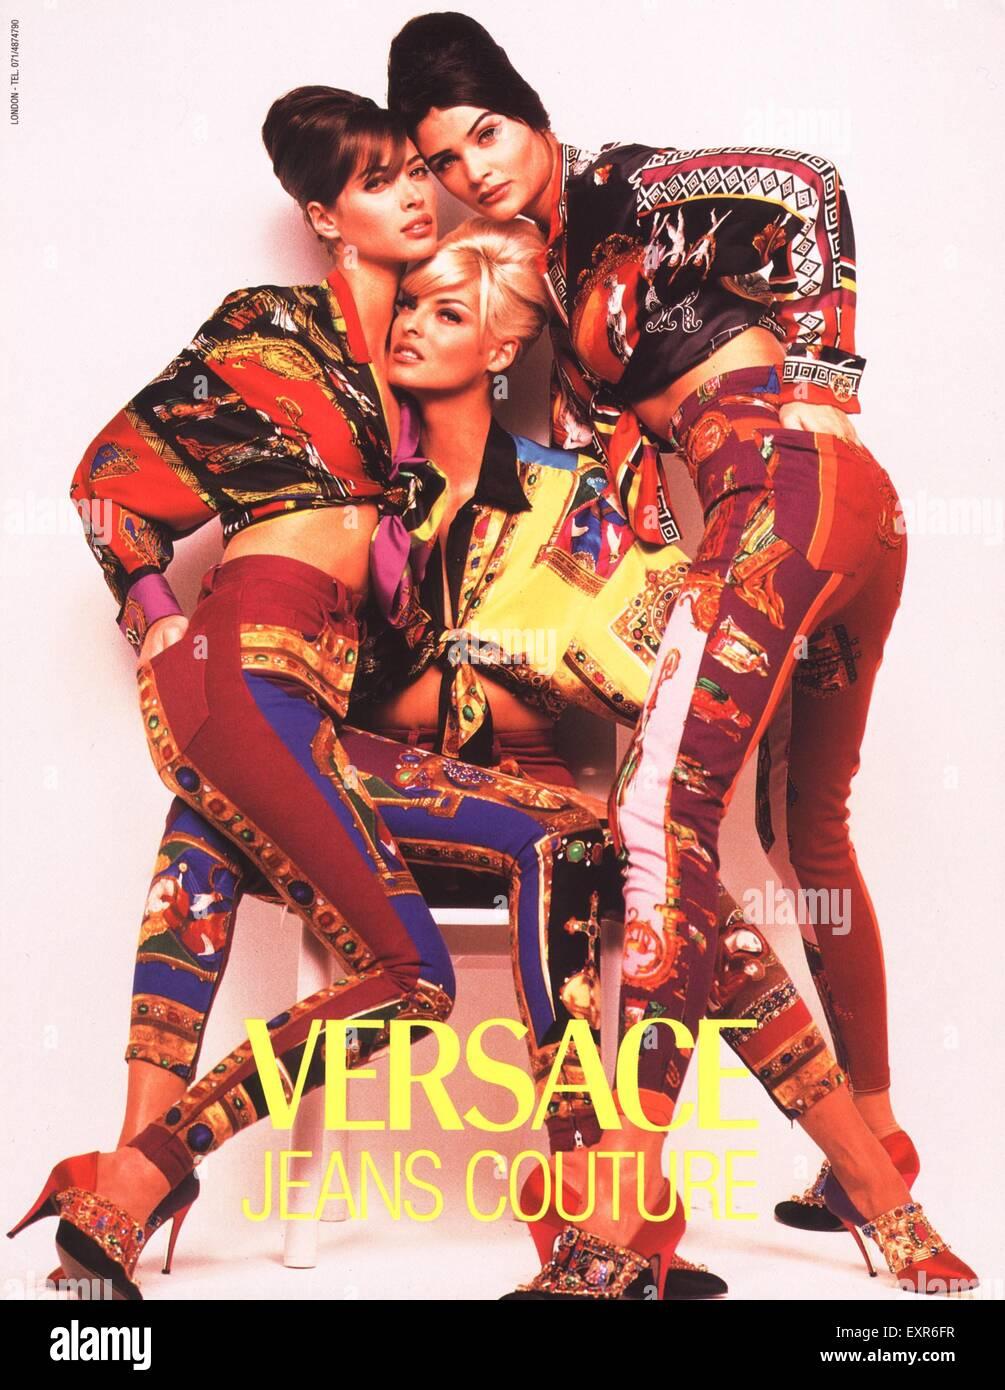 1990s Fashion Stock Photos & 1990s Fashion Stock Images - Alamy